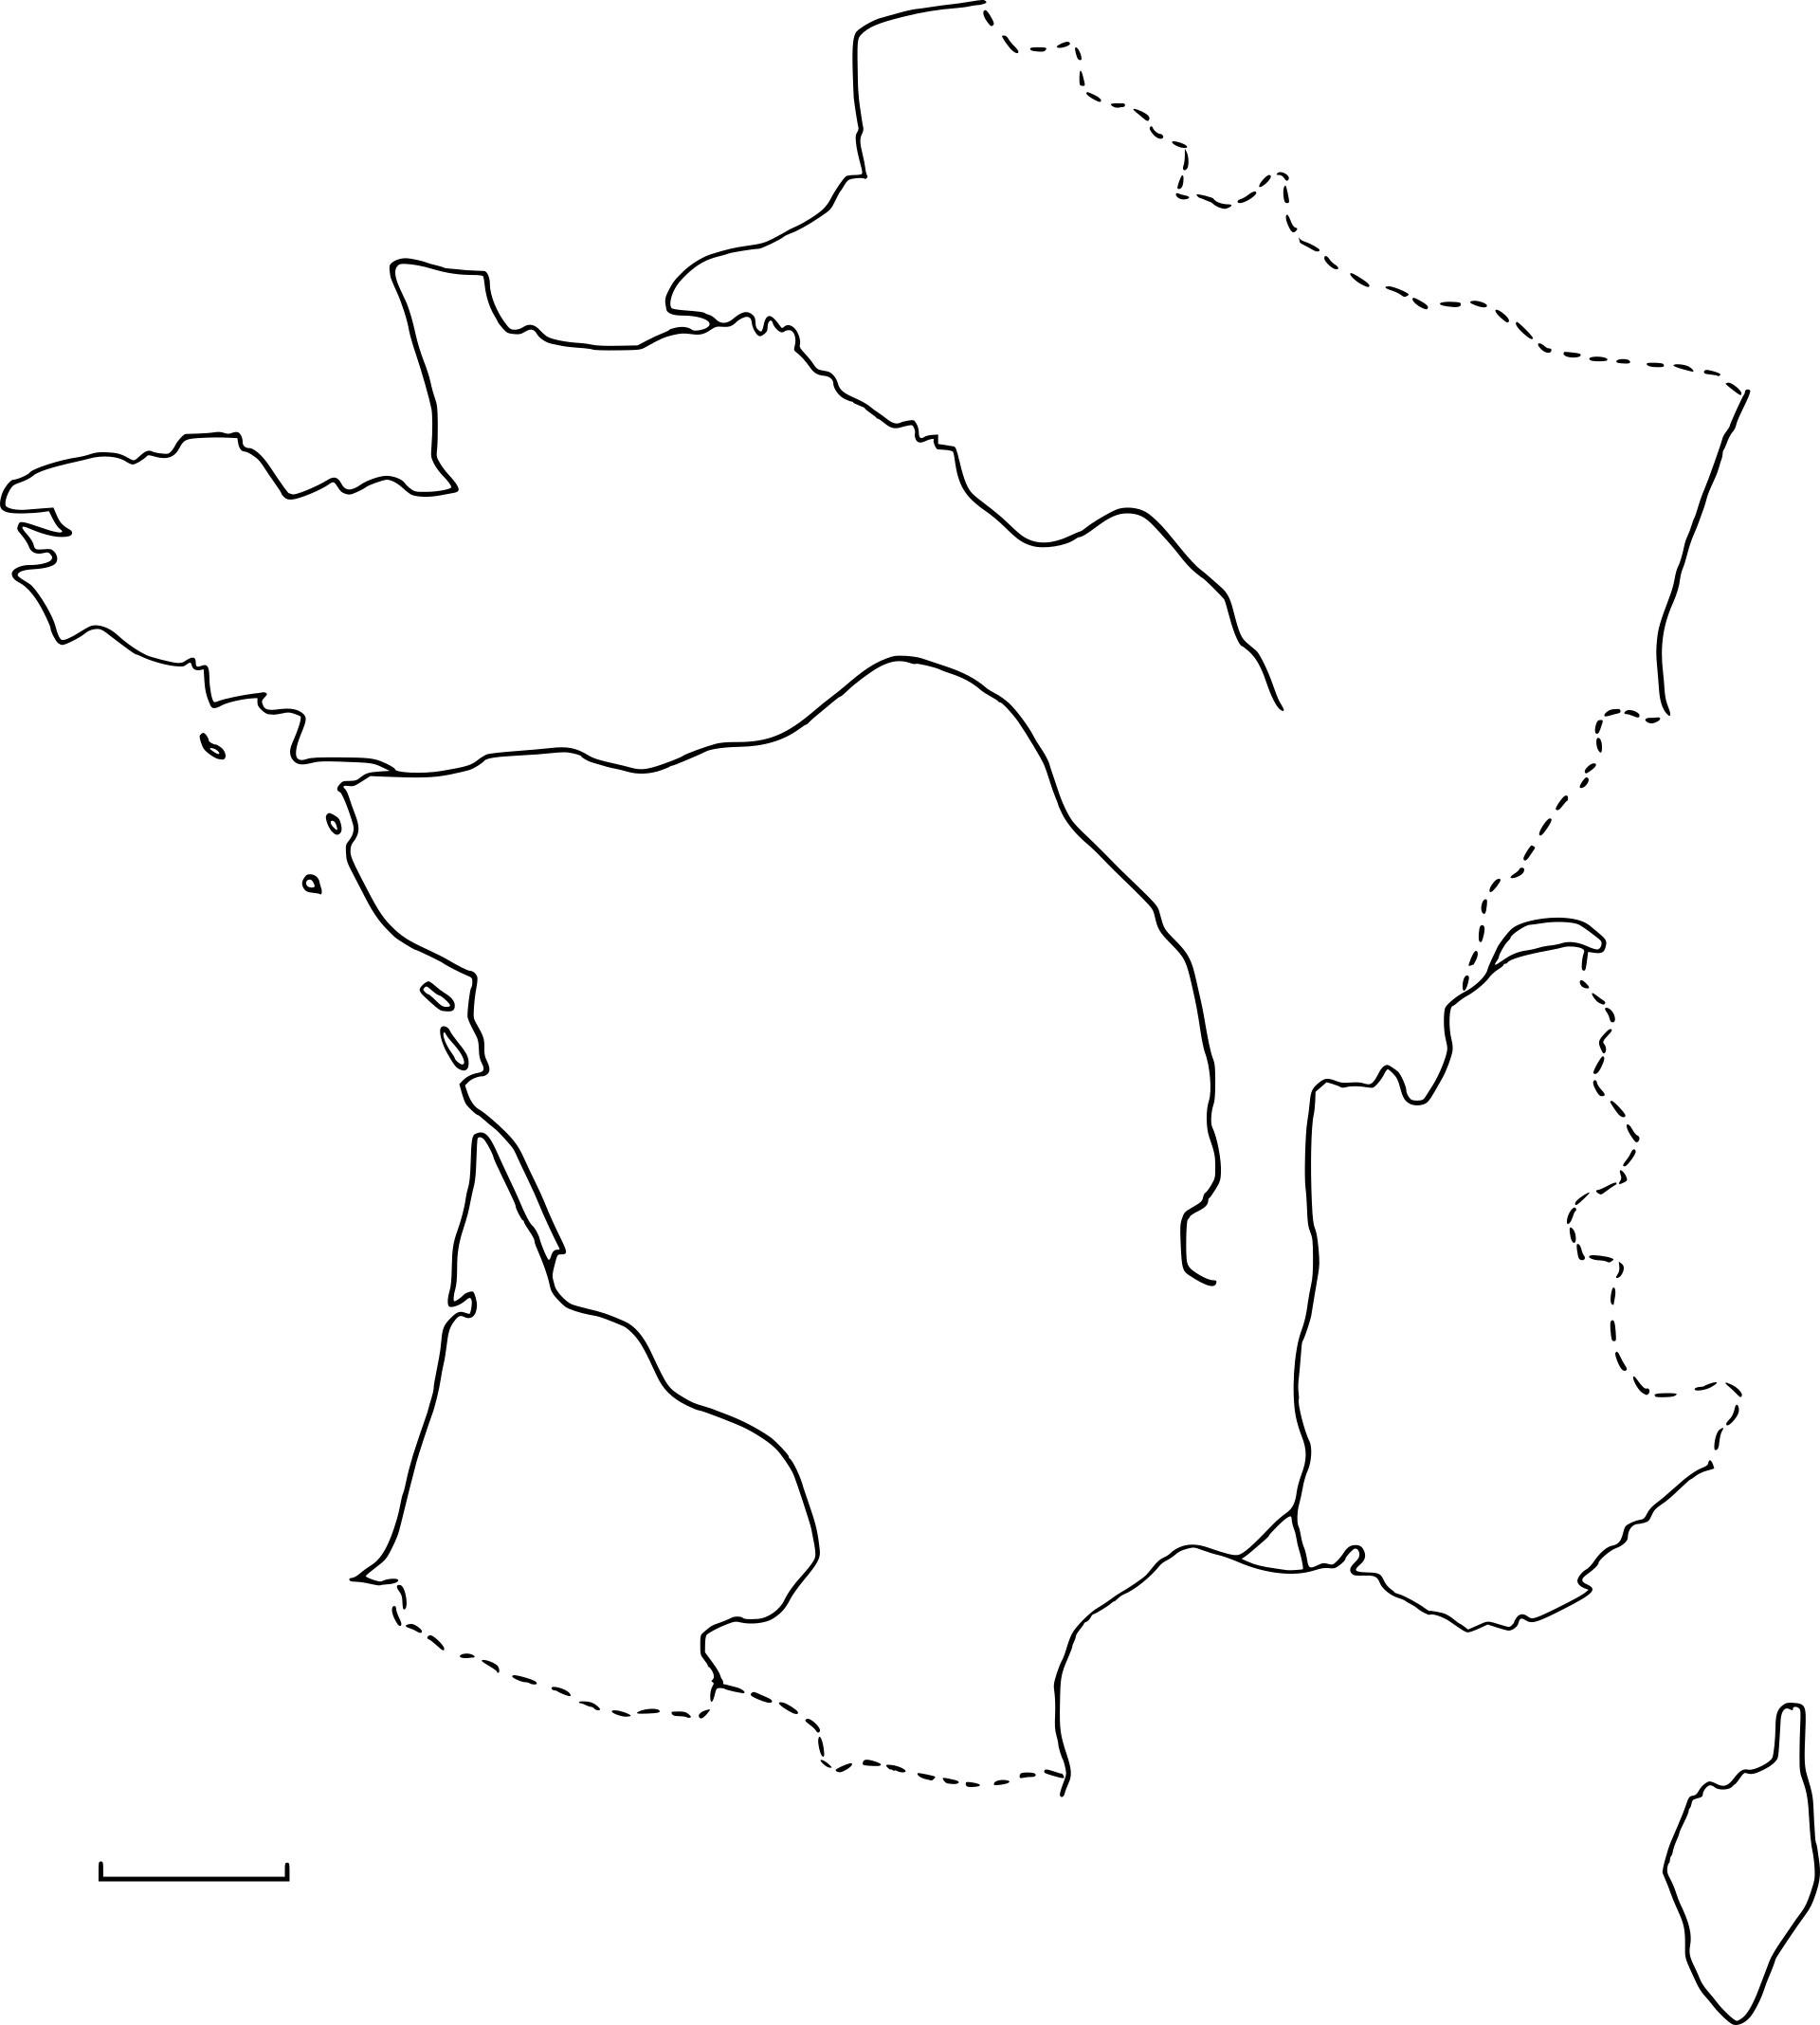 Carte De France A Imprimer Vierge   My Blog dedans Carte De France Avec Departement A Imprimer